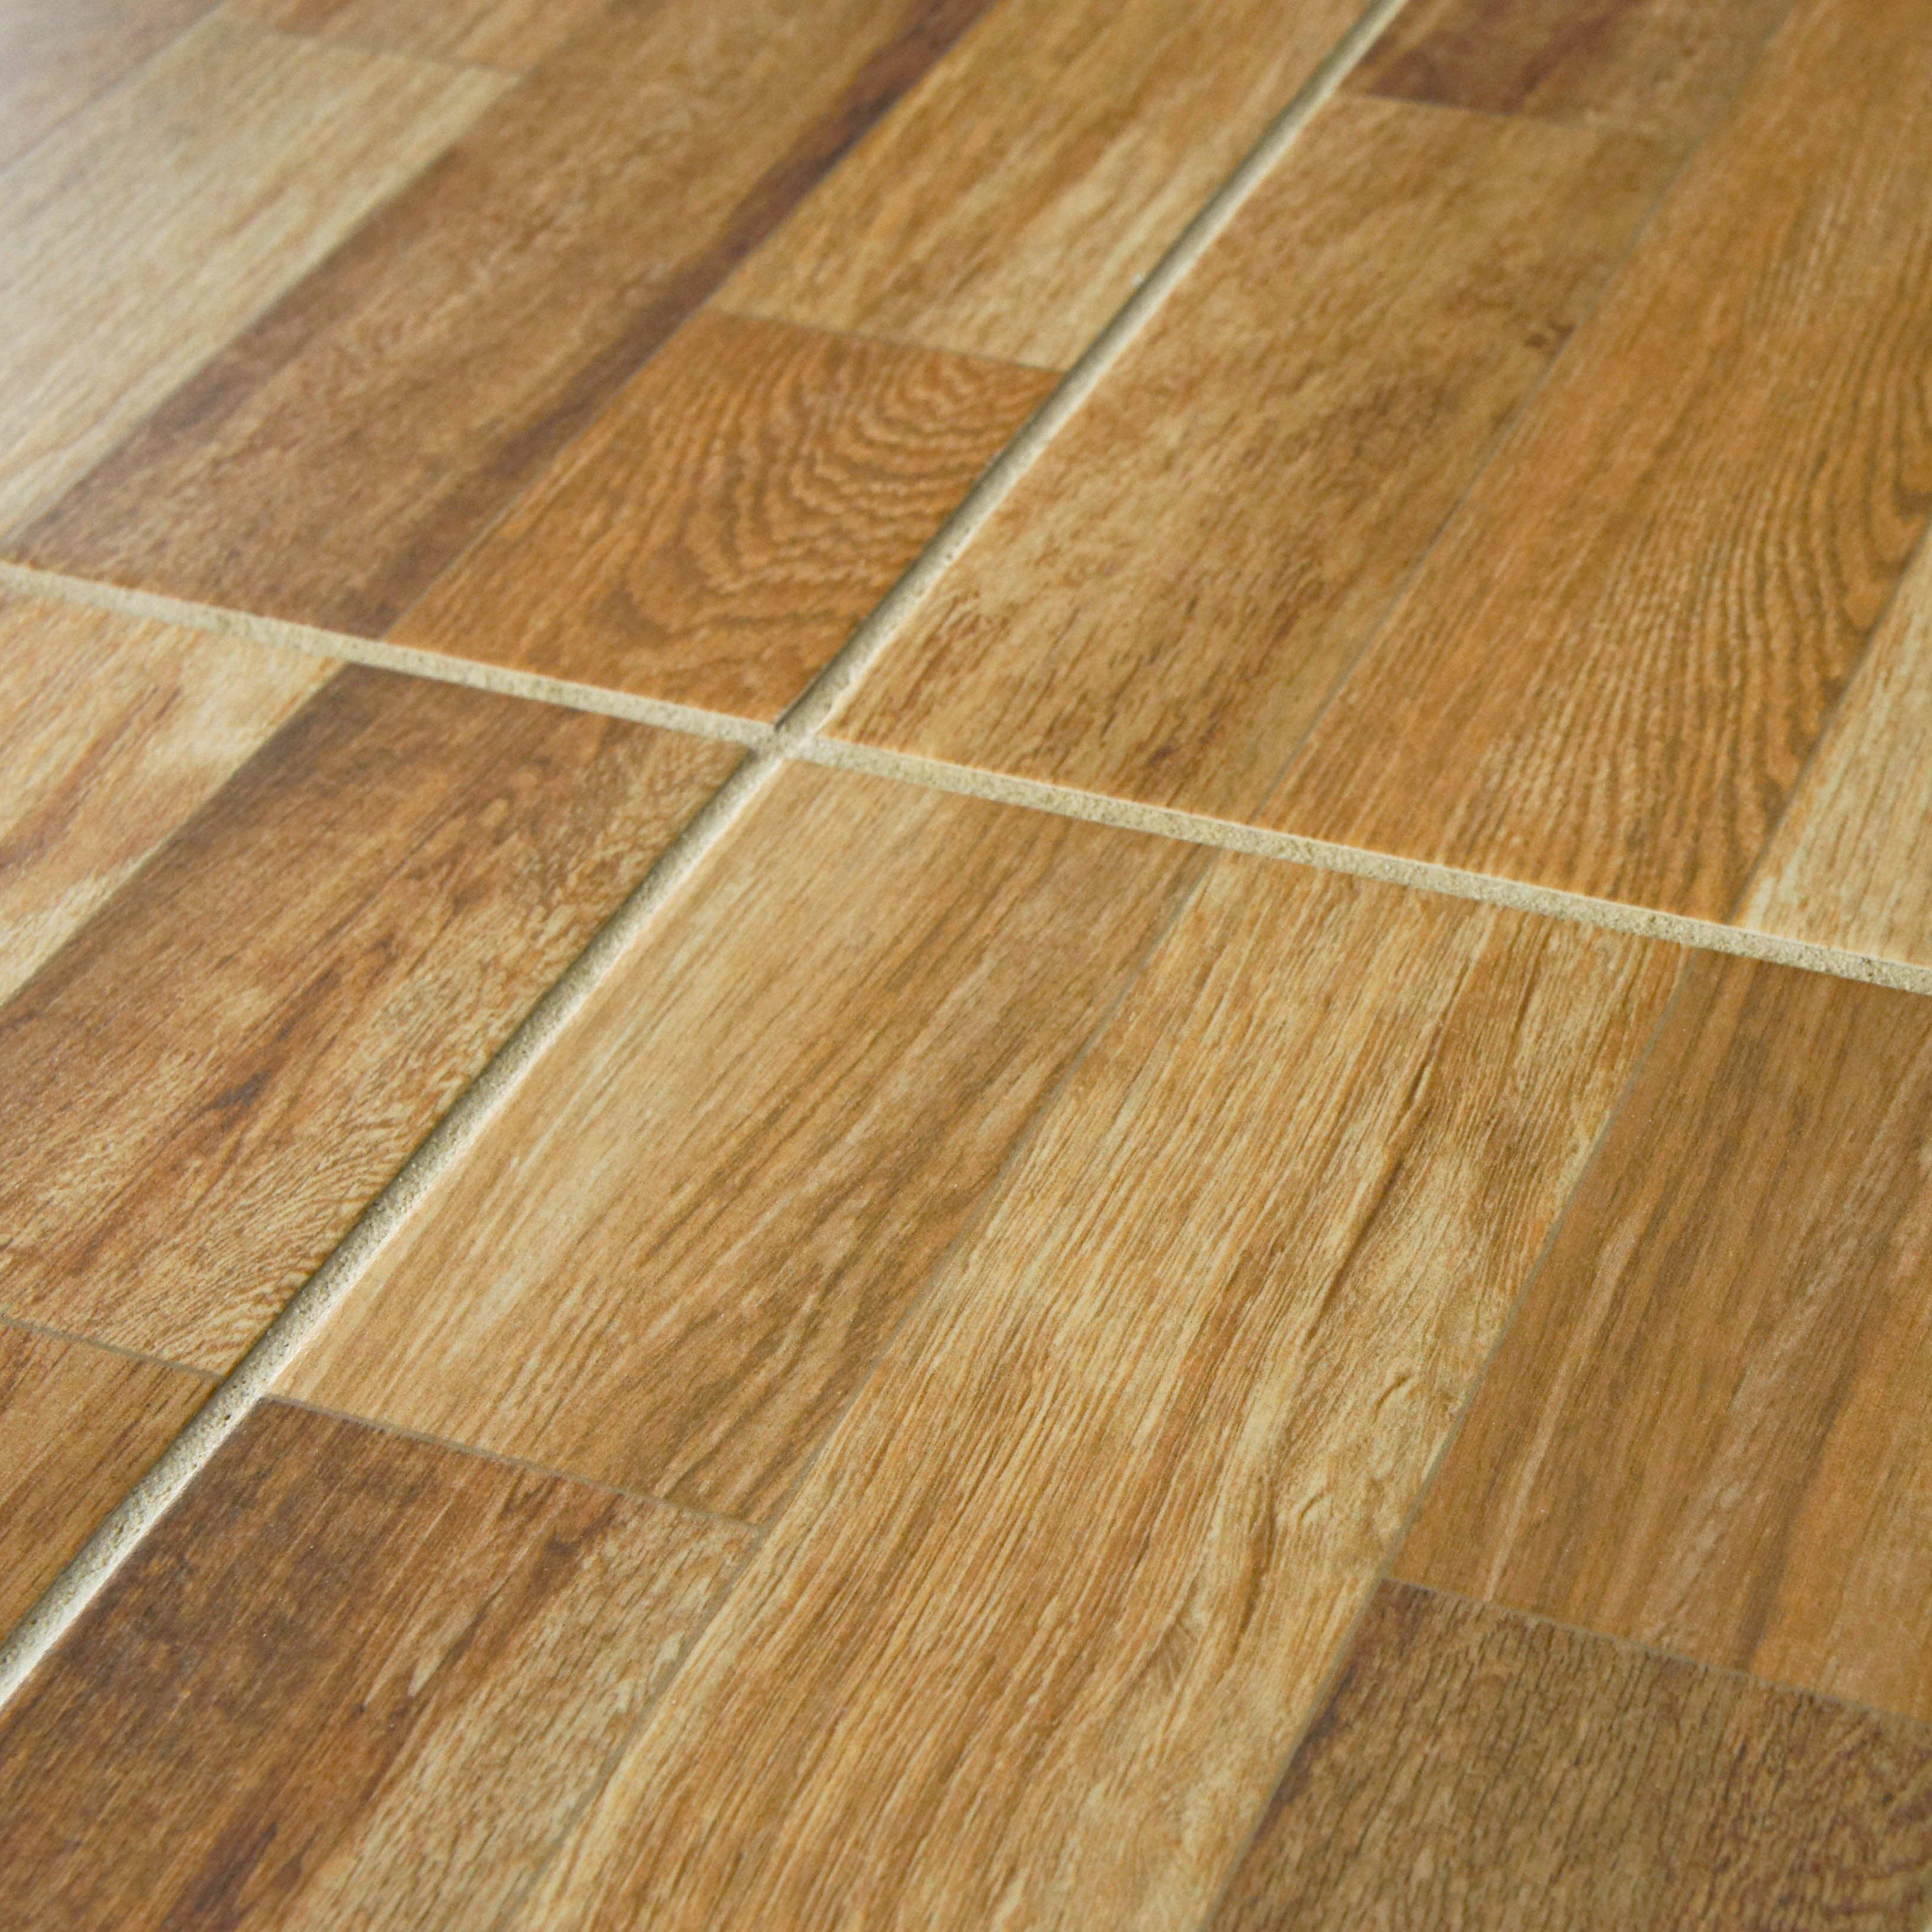 Elitetile prospero x ceramic wood tile in - Baldosas exterior antideslizantes bricodepot ...